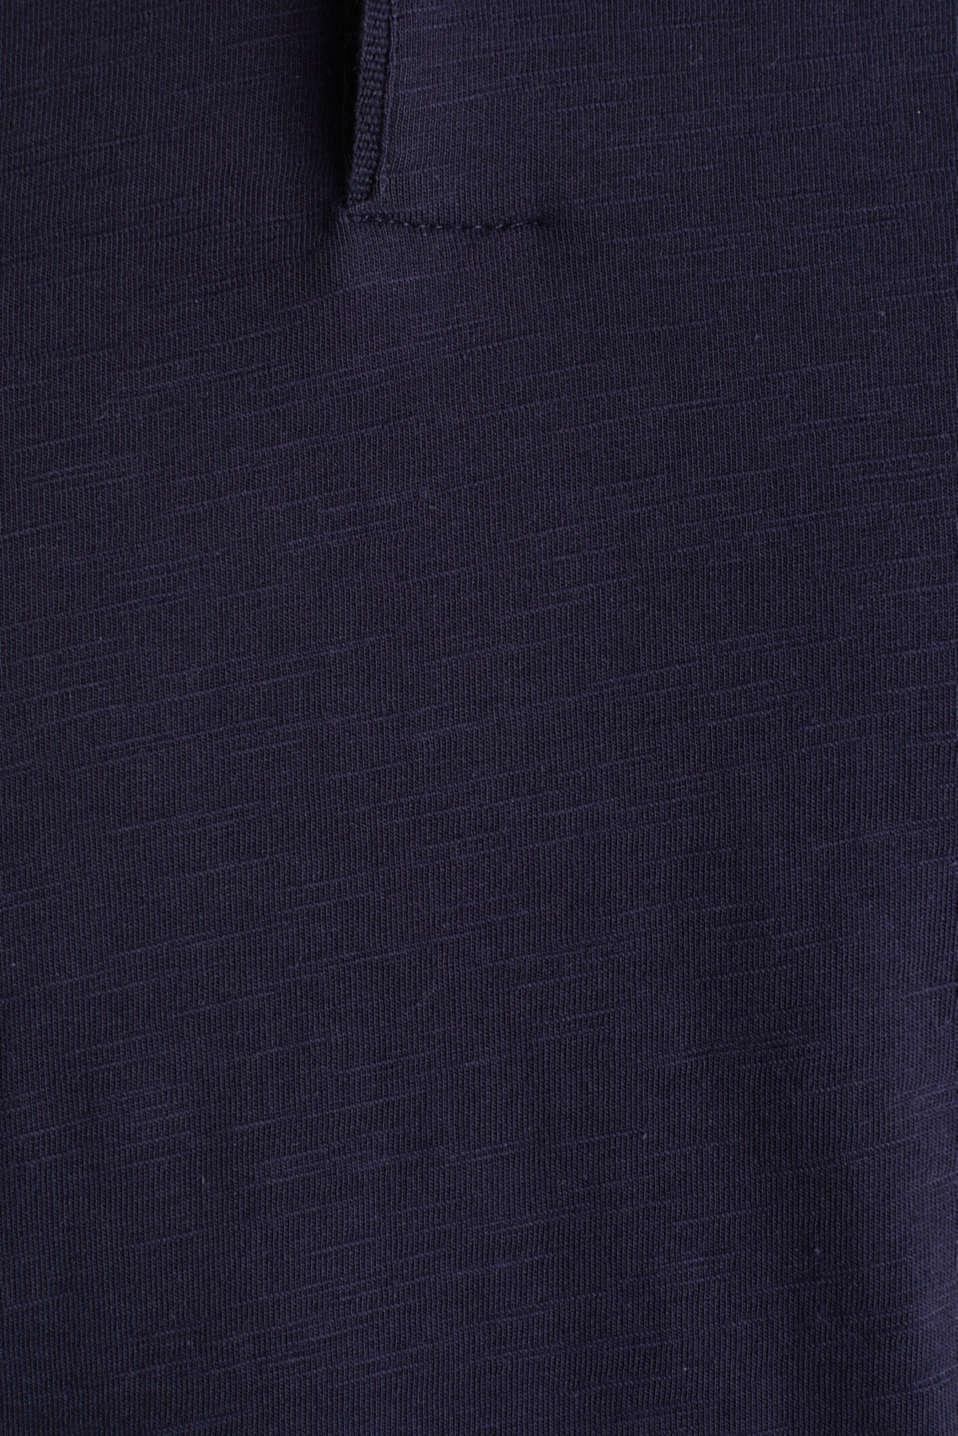 Slub jersey polo shirt, 100% cotton, NAVY, detail image number 4